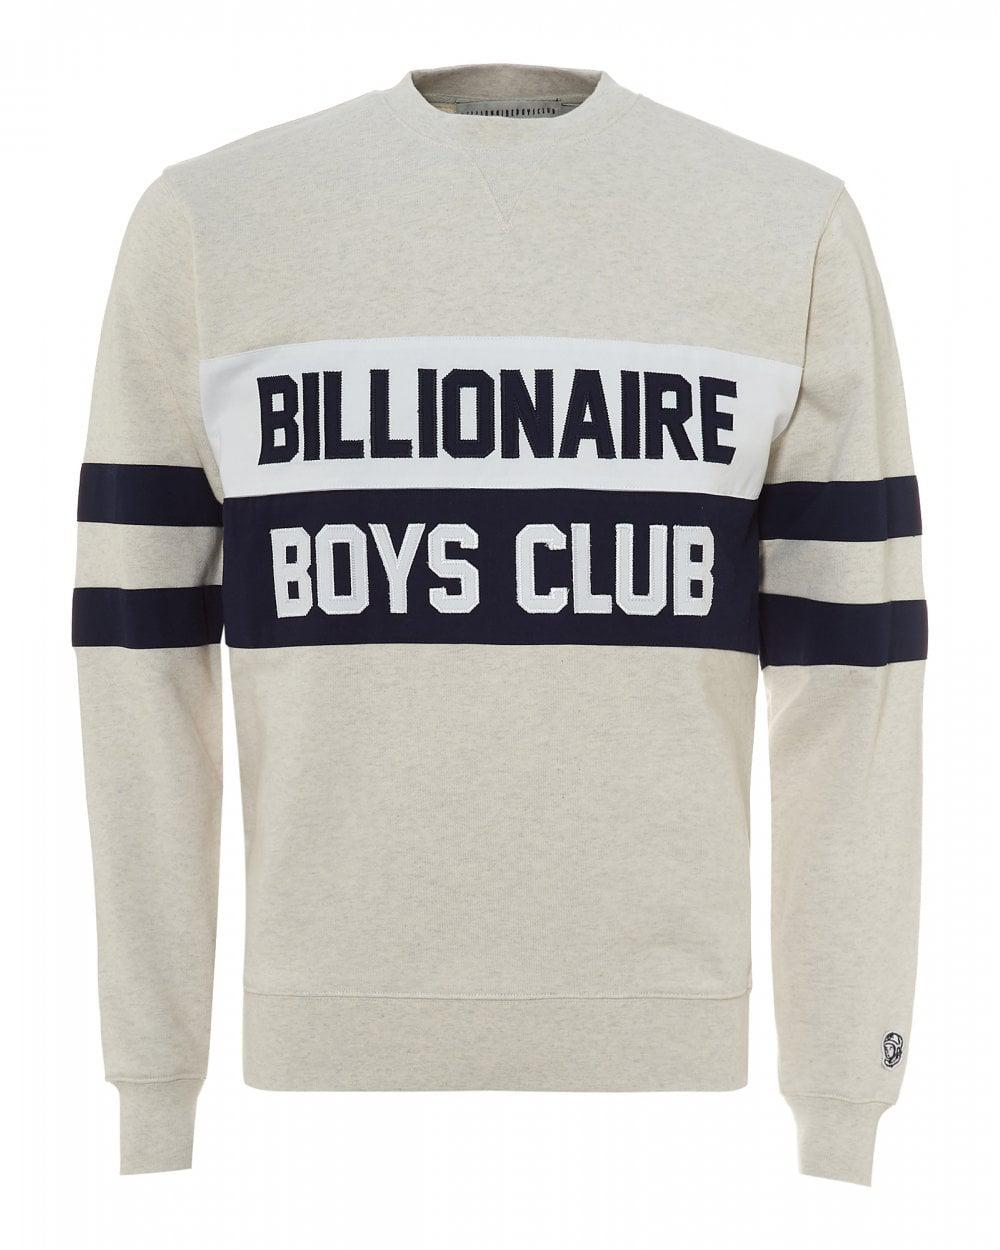 9d9a3a8b148 BBCICECREAM. Men s Varsity Cut And Sew Sweatshirt ...